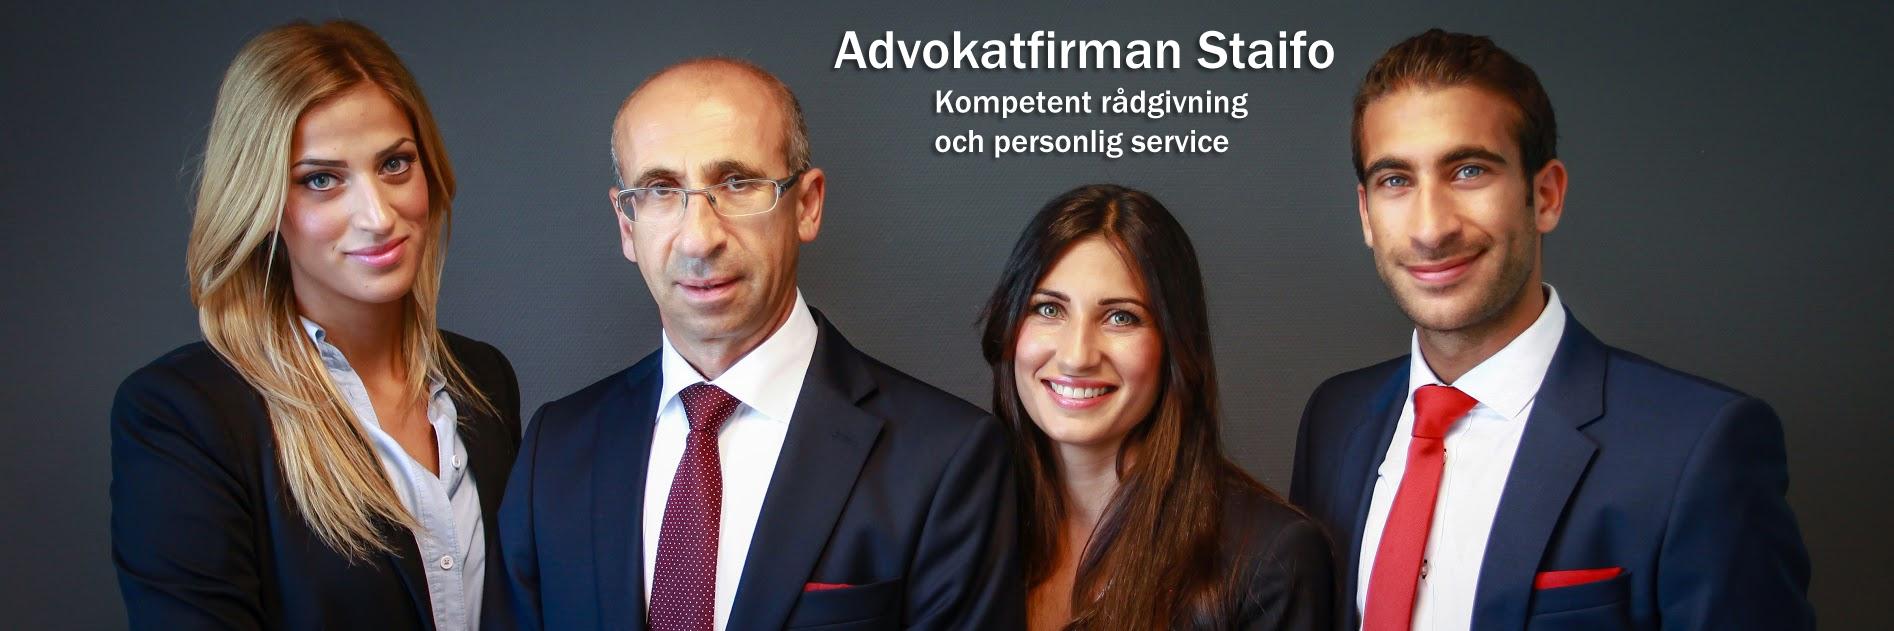 Advokatfirman Staifo